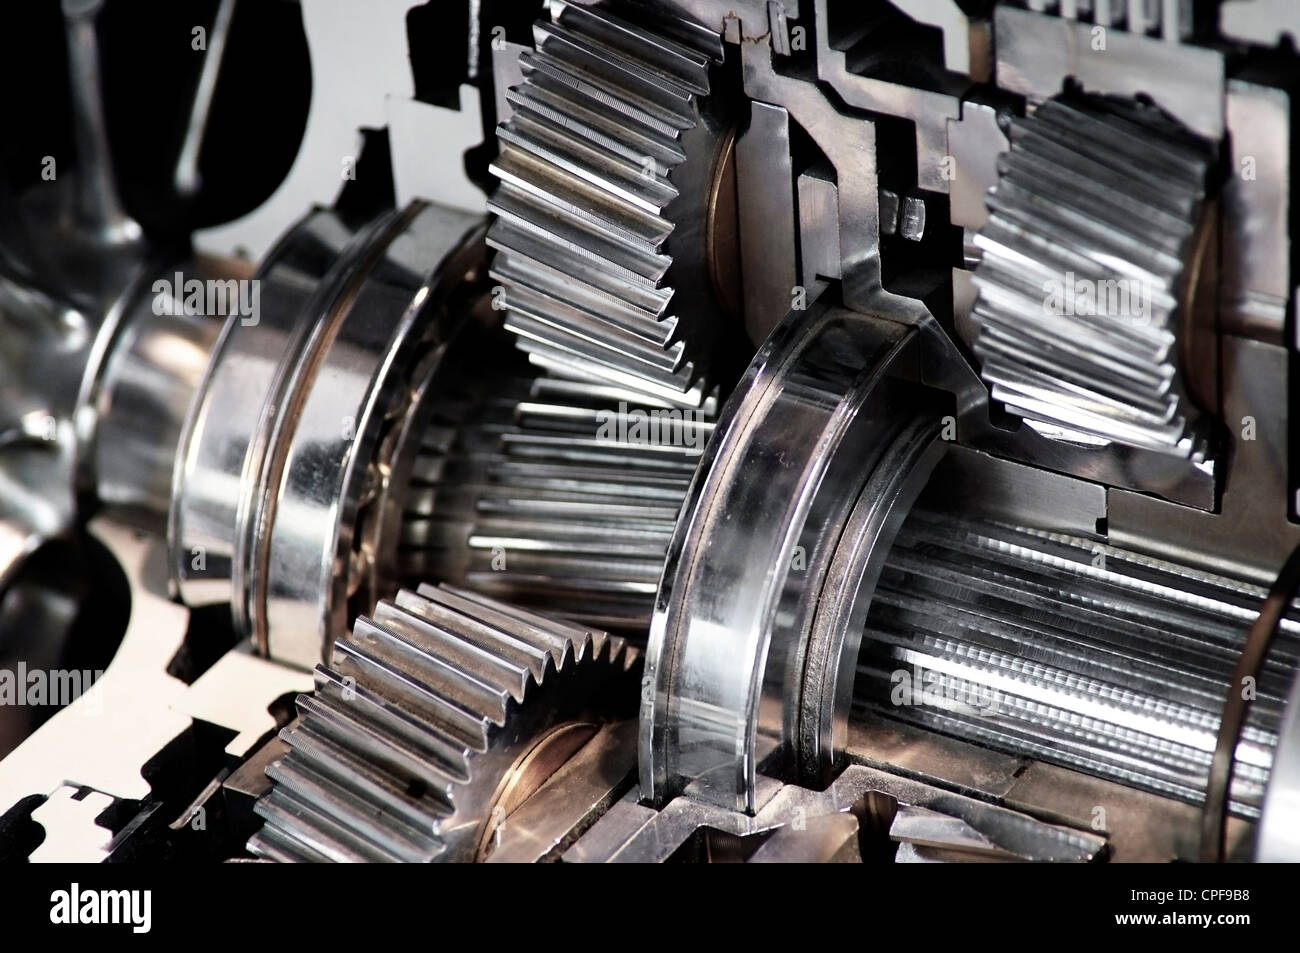 Closeup of a car's transmission - Stock Image